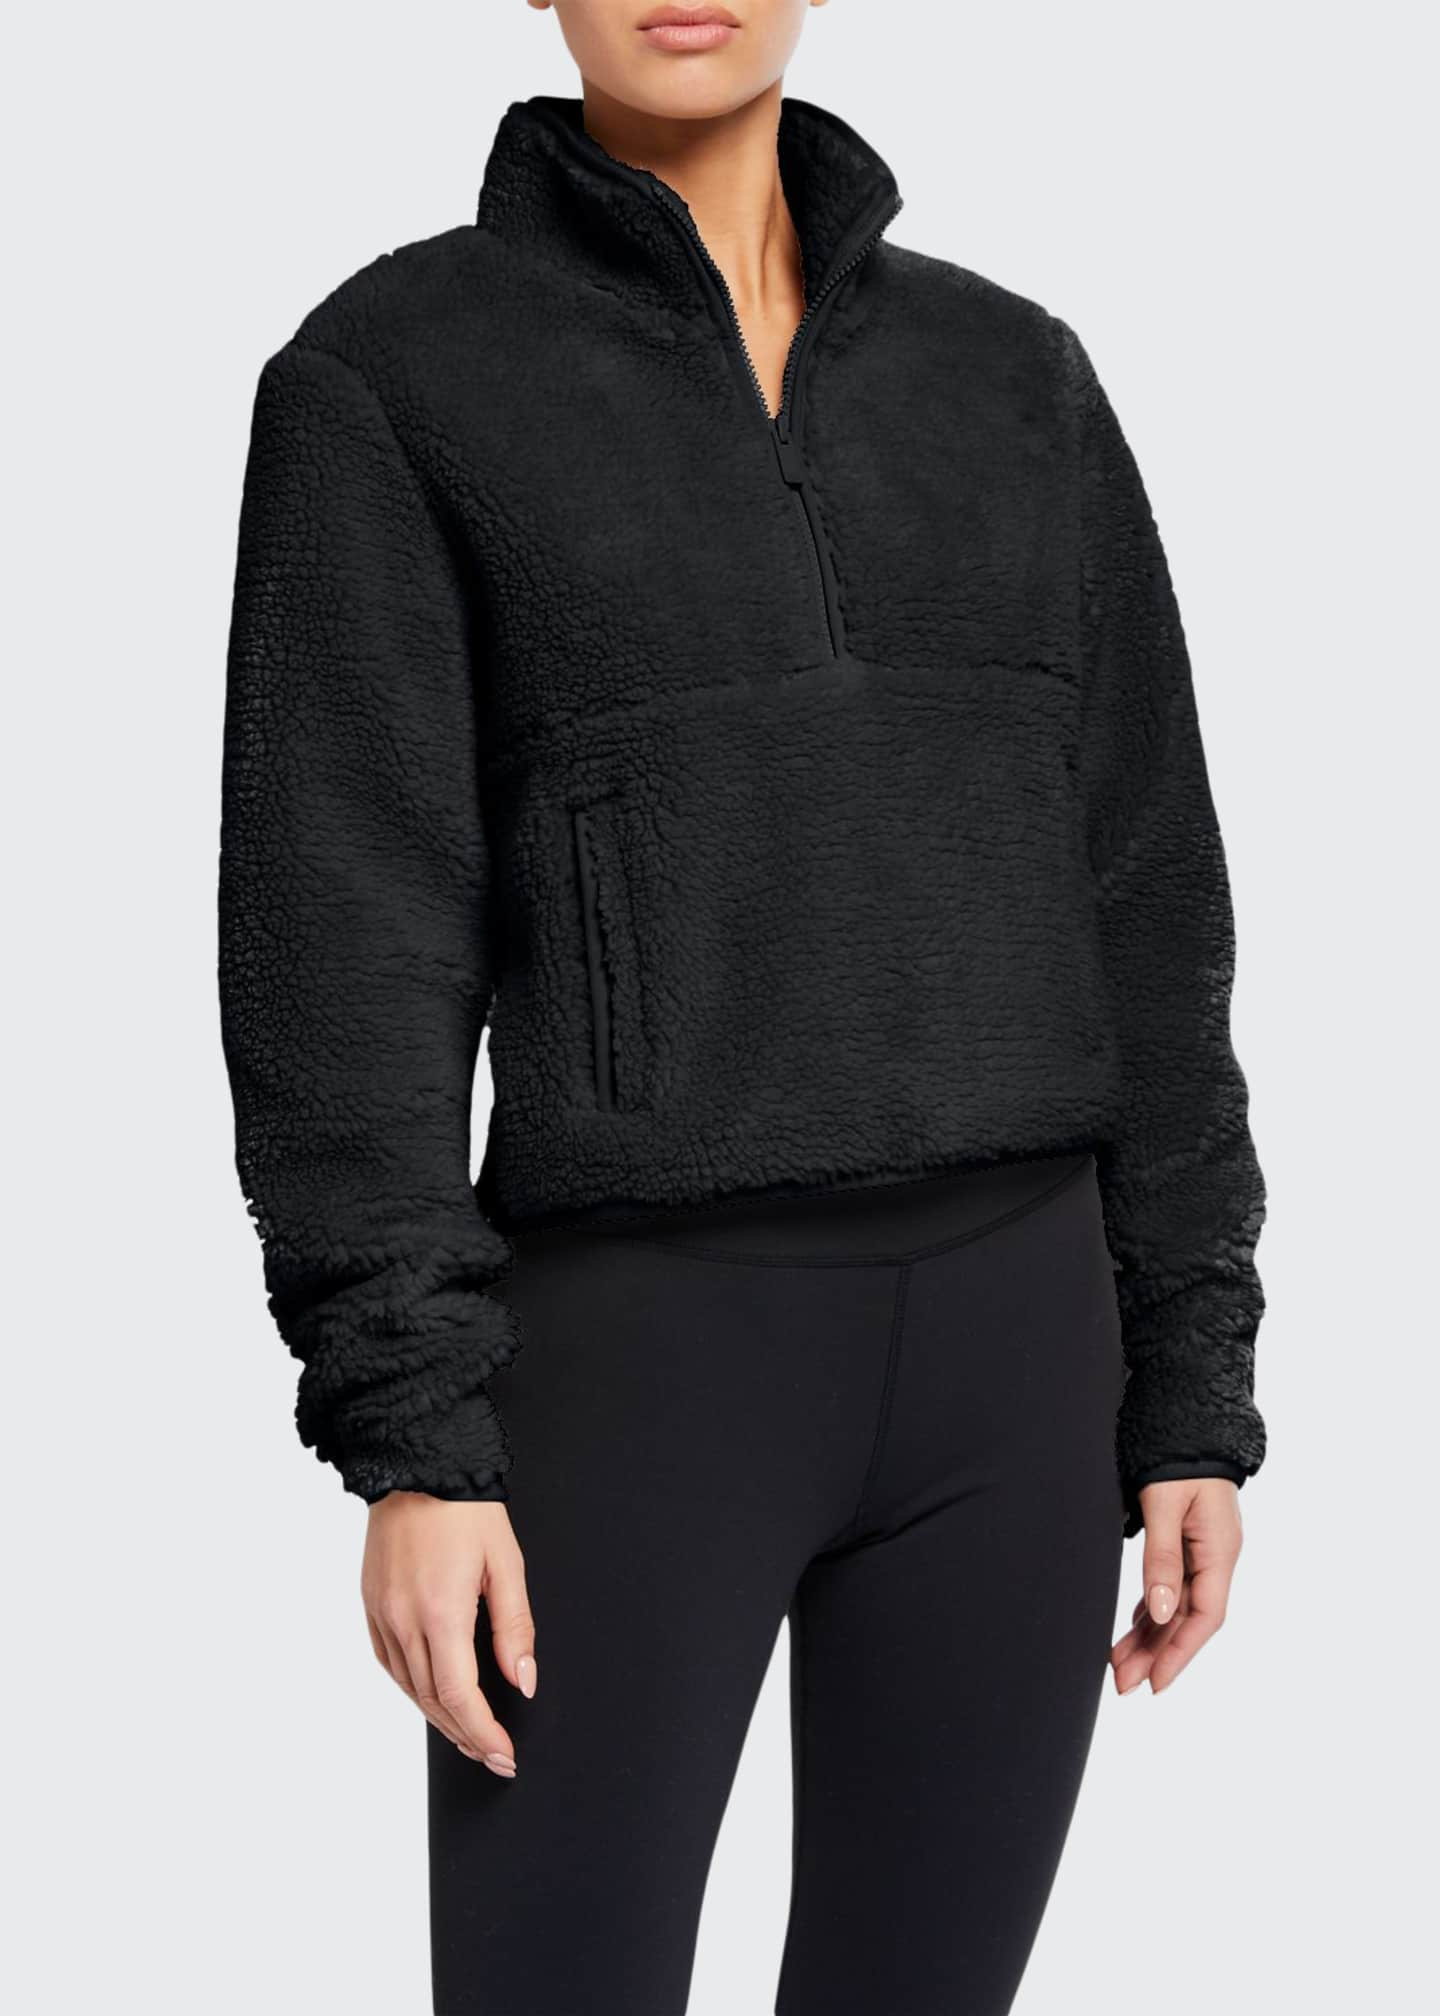 Alo Yoga Shanti Half-Zip Sherpa Fleece Jacket